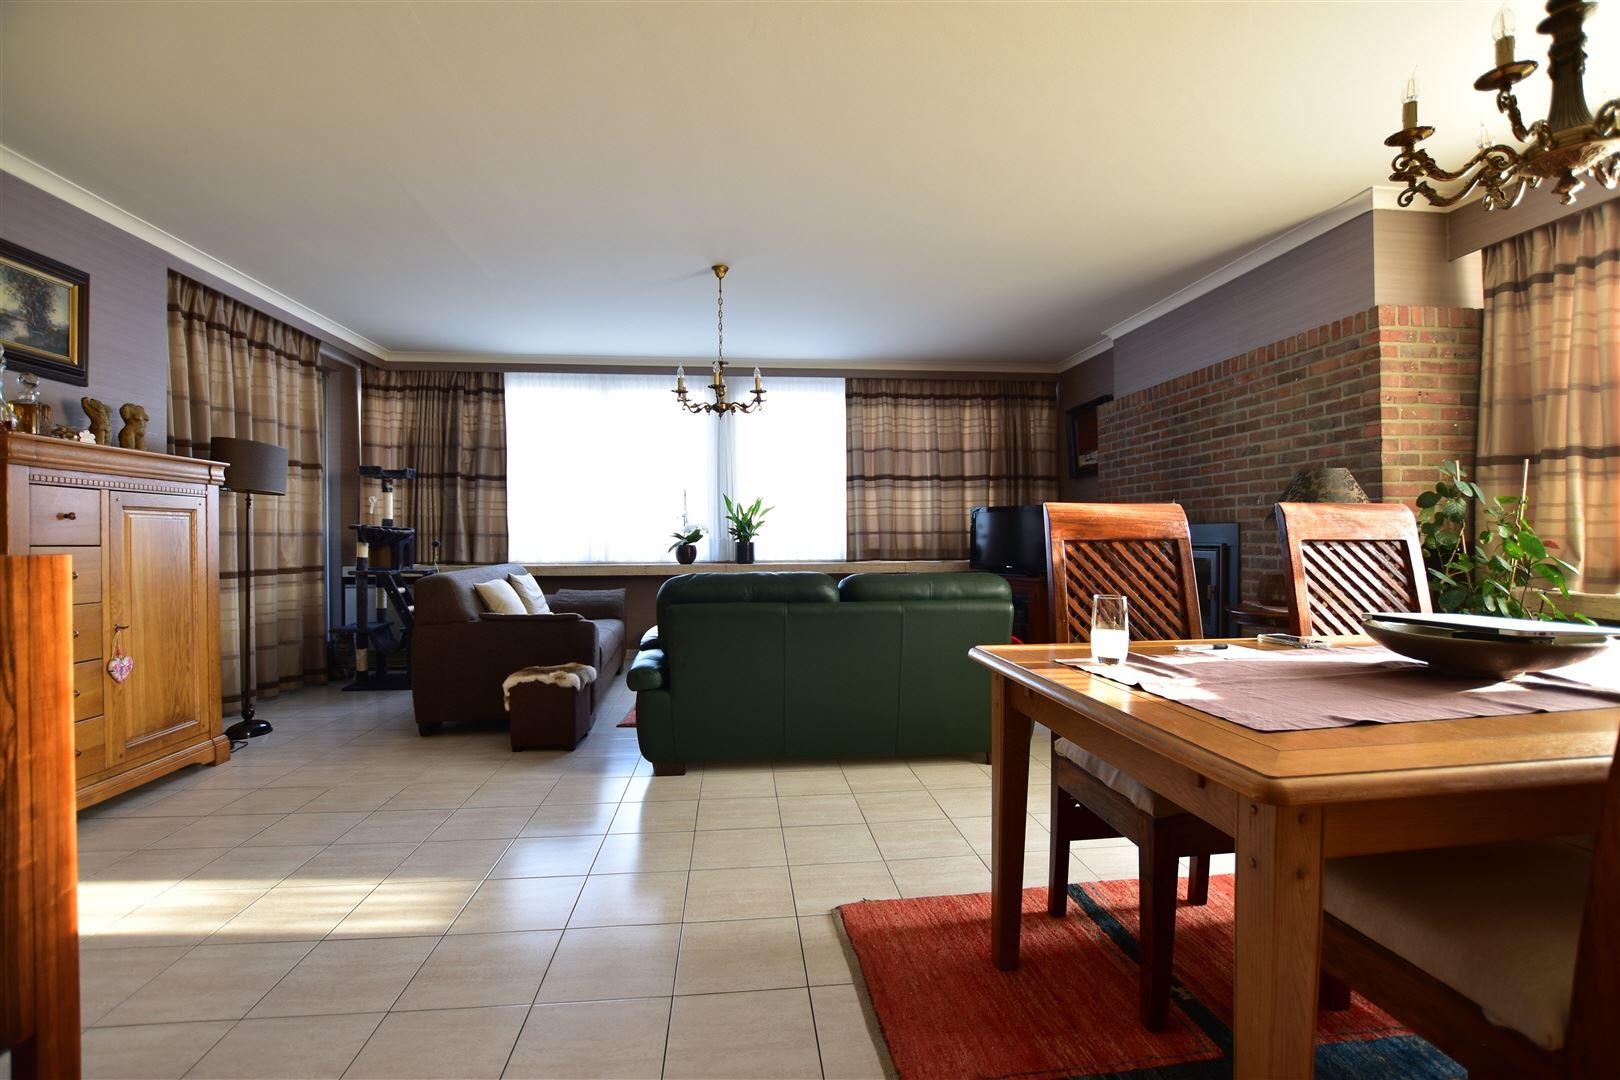 Foto 2 : Appartement te 9140 TEMSE (België) - Prijs € 299.000